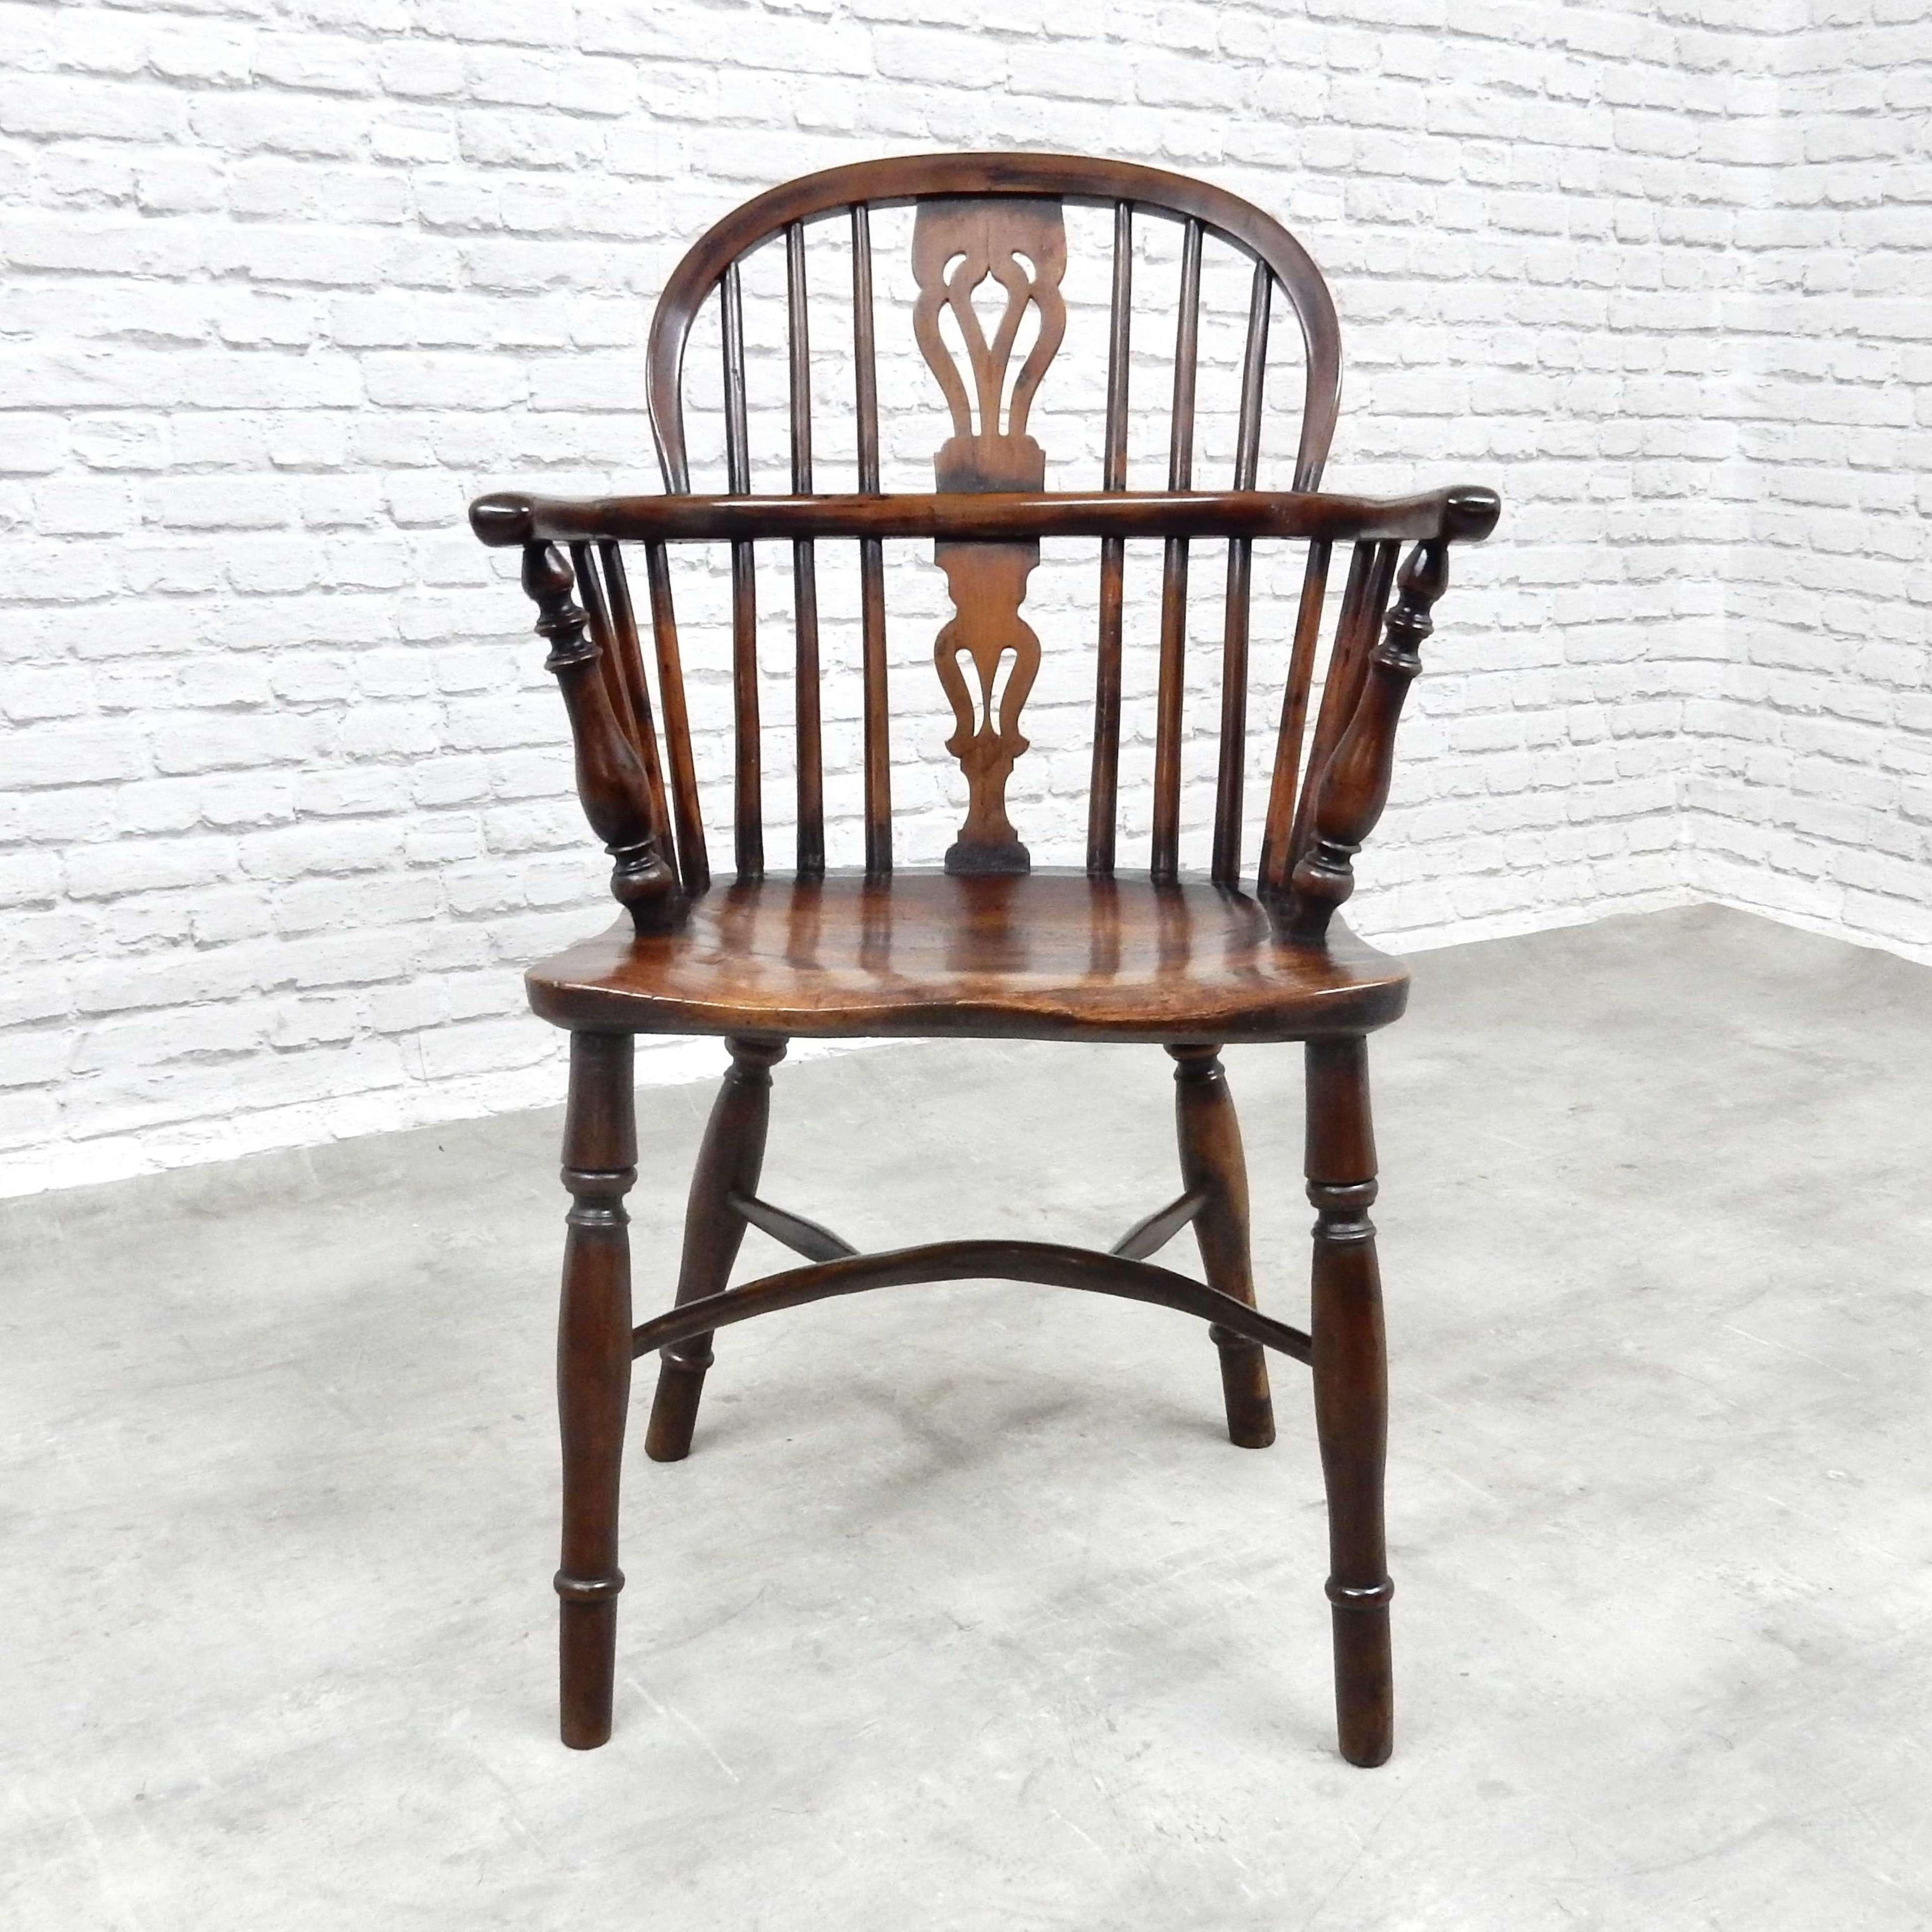 Antique Yew Wood Windsor Armchair